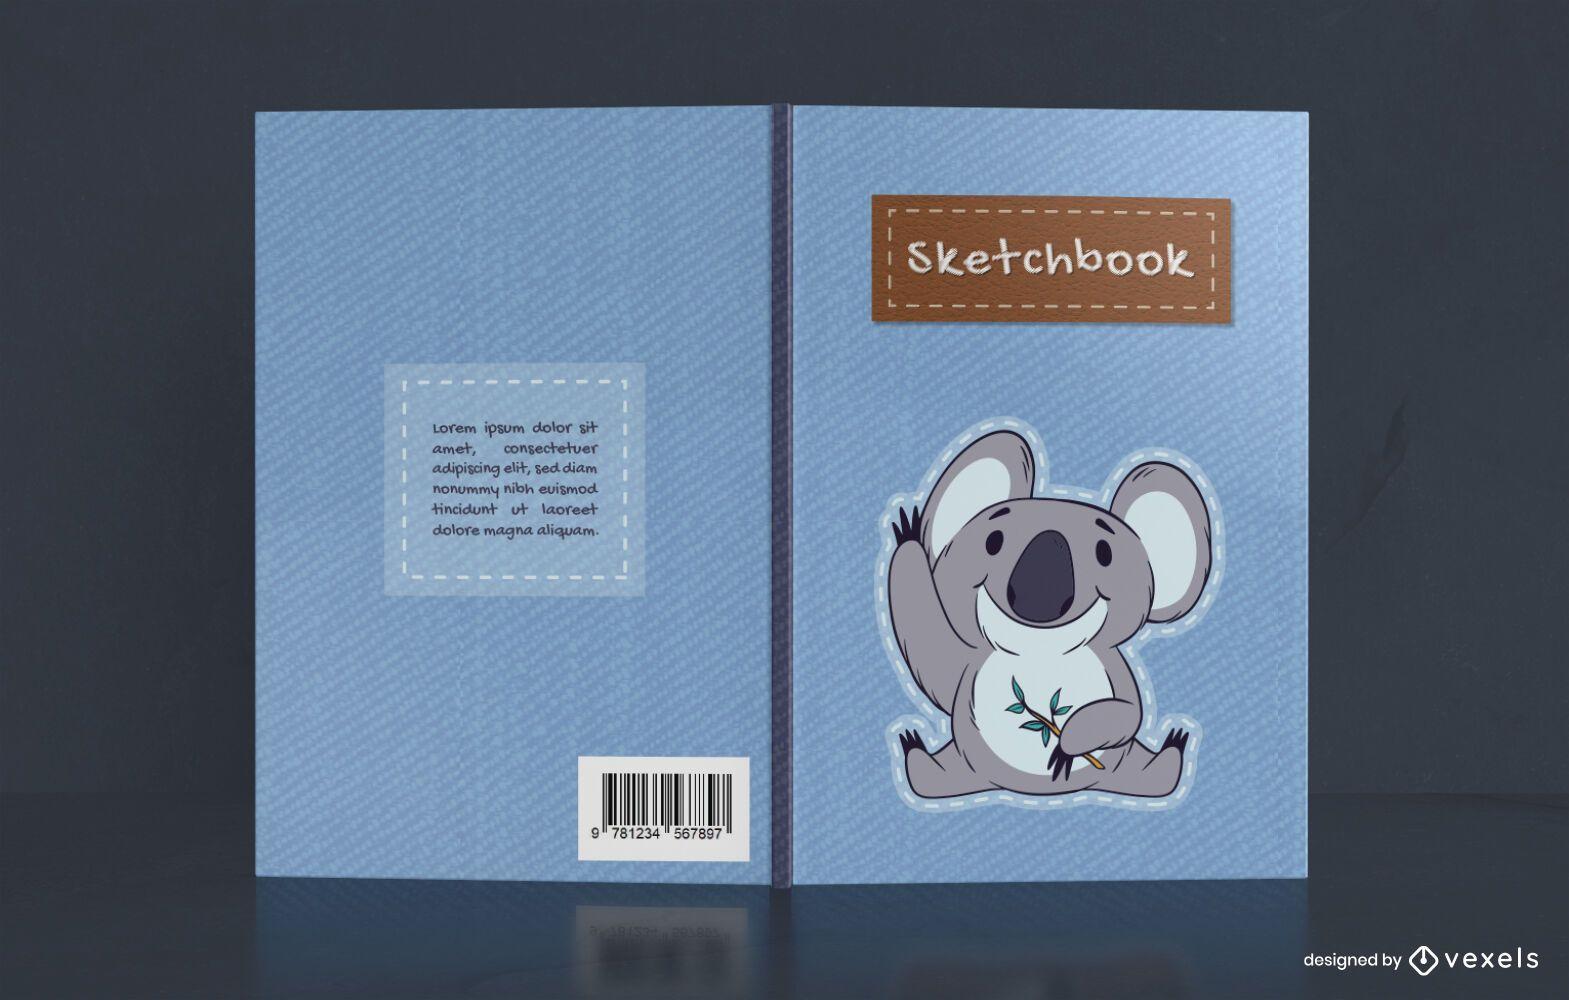 Cute Koala Sketchbook Cover Design